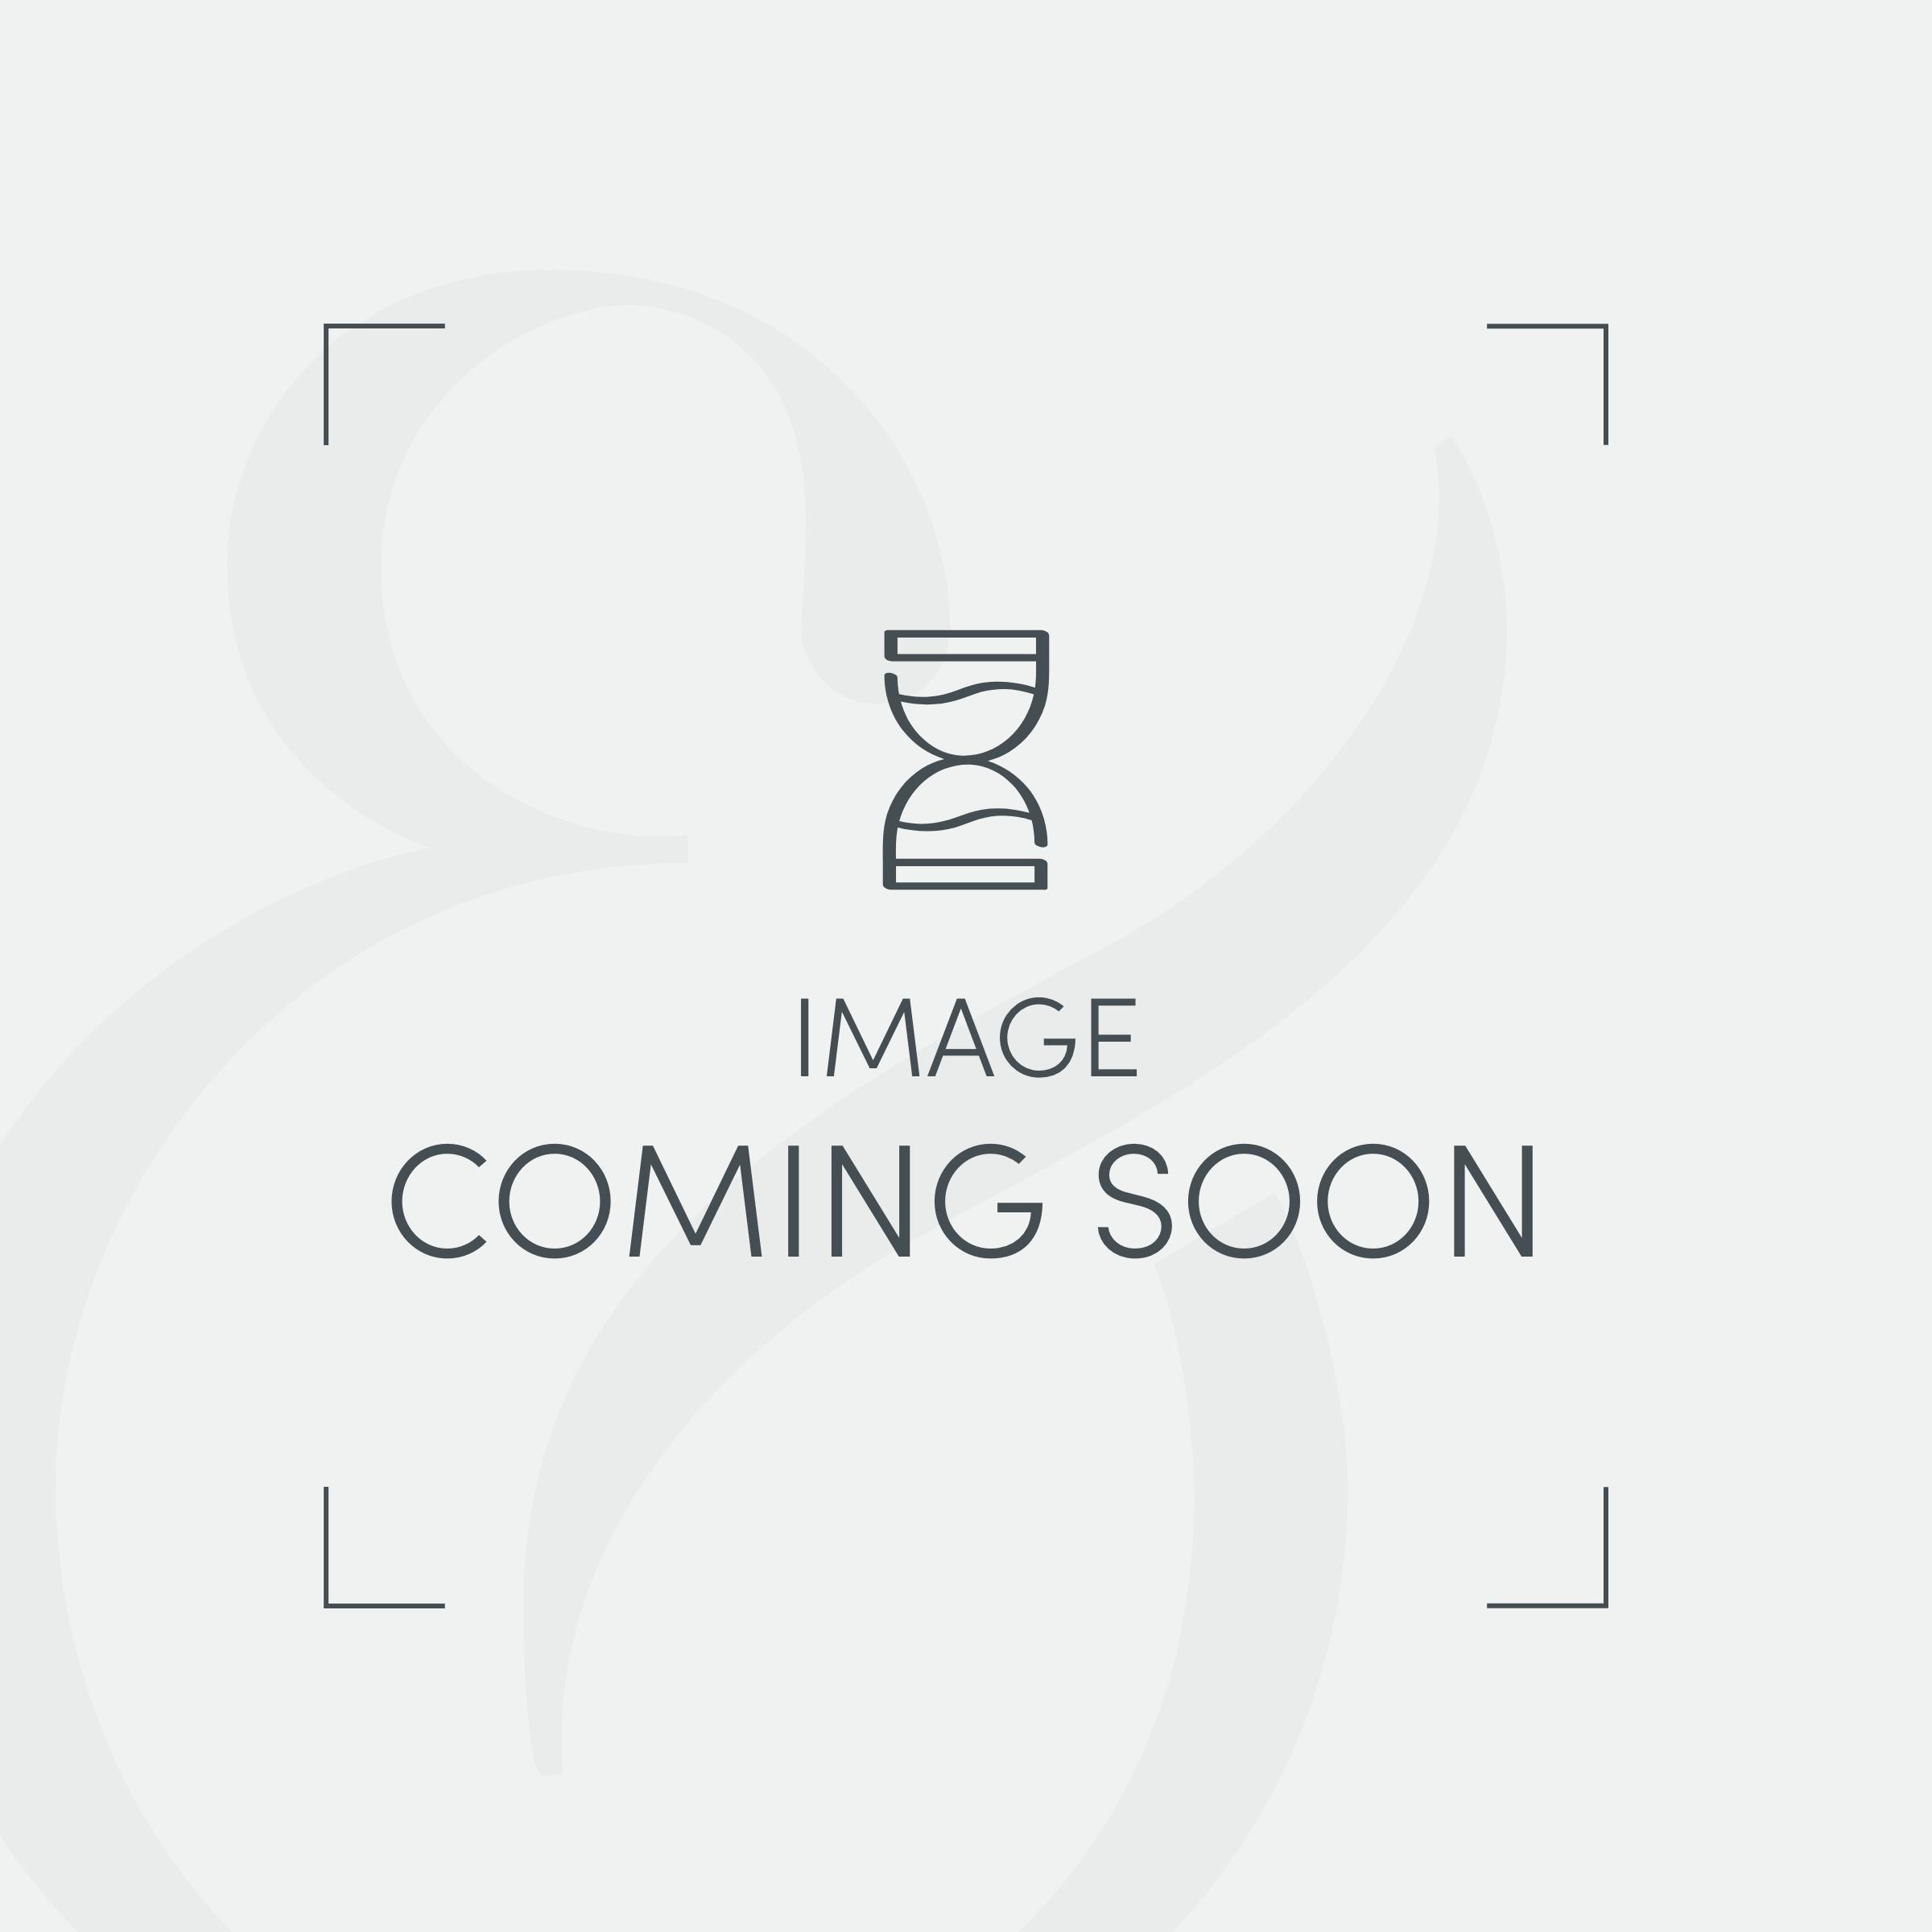 Ultimate Silk Bedspread - King/Superking - Silver Grey